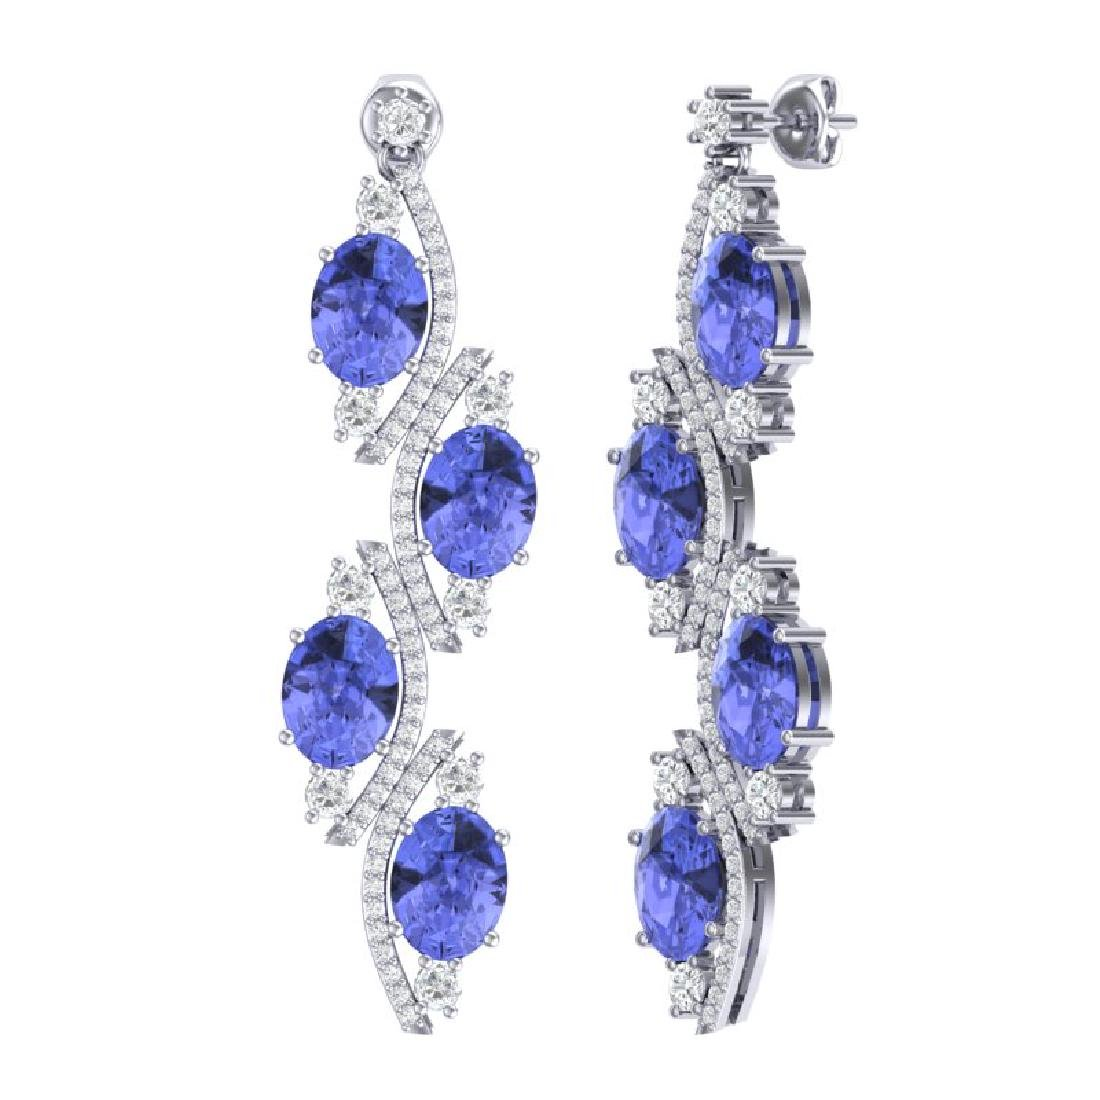 16.23 CTW Royalty Tanzanite & VS Diamond Earrings 18K - 3